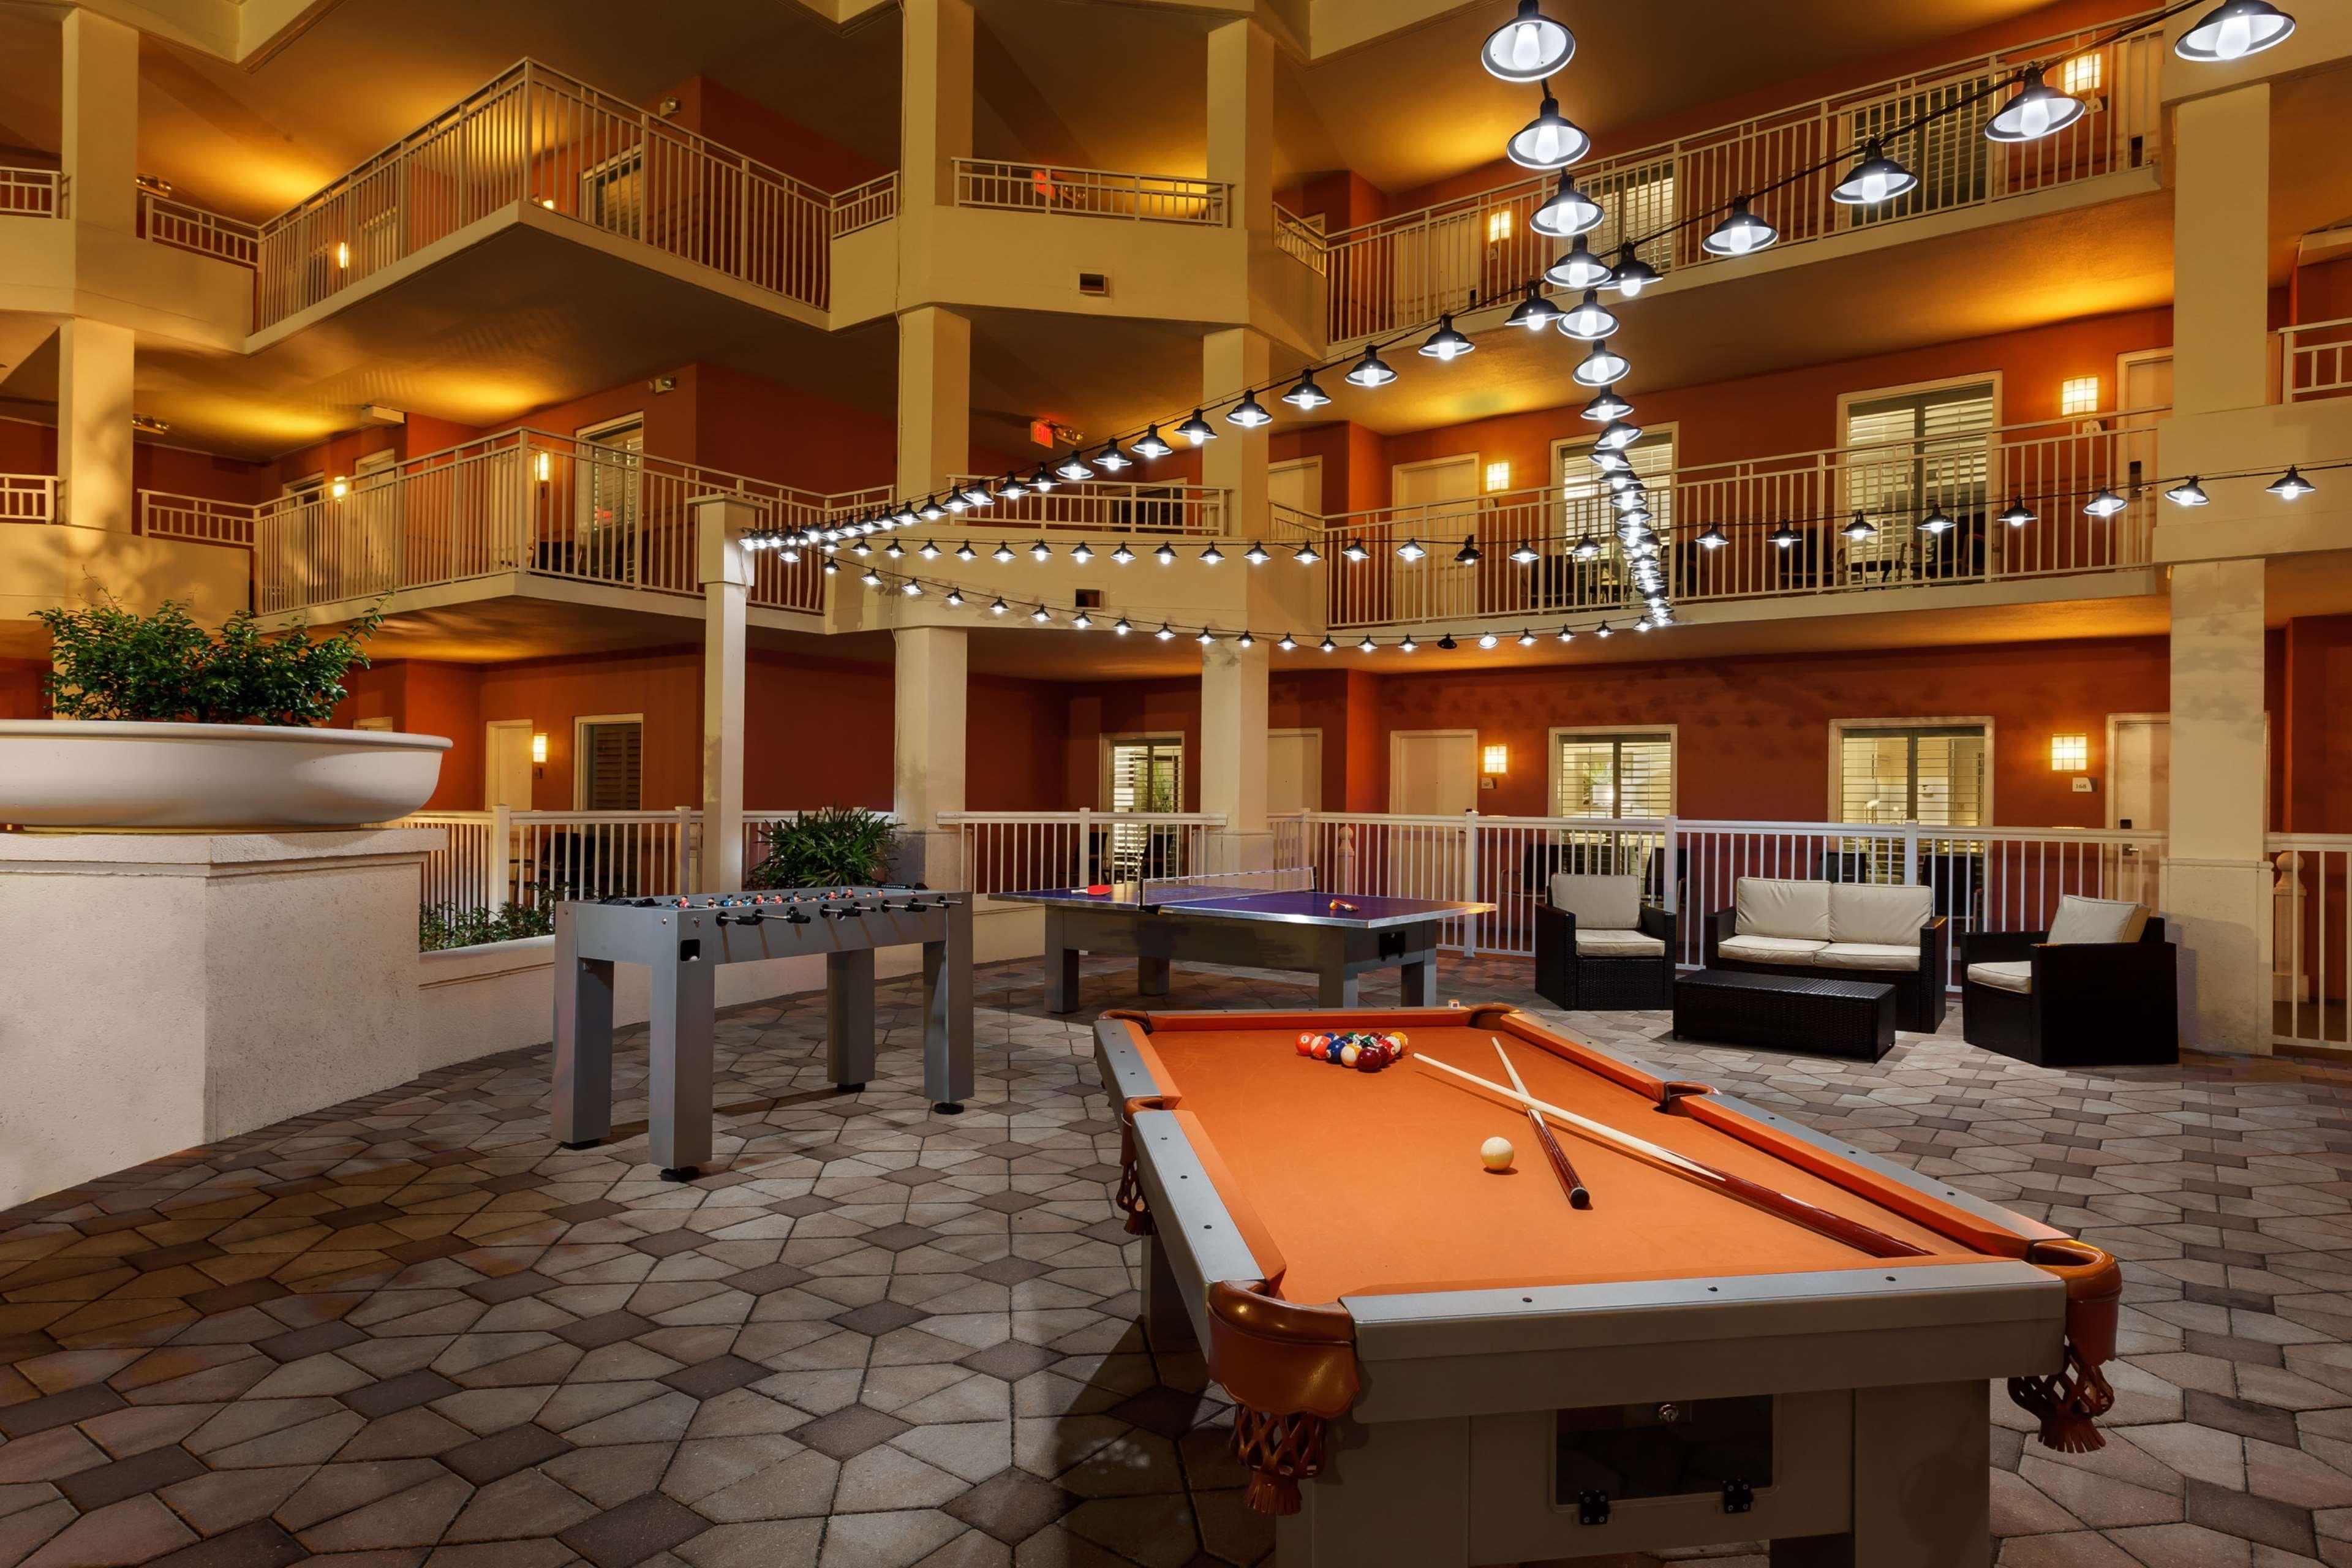 Embassy Suites by Hilton Orlando Lake Buena Vista Resort image 32